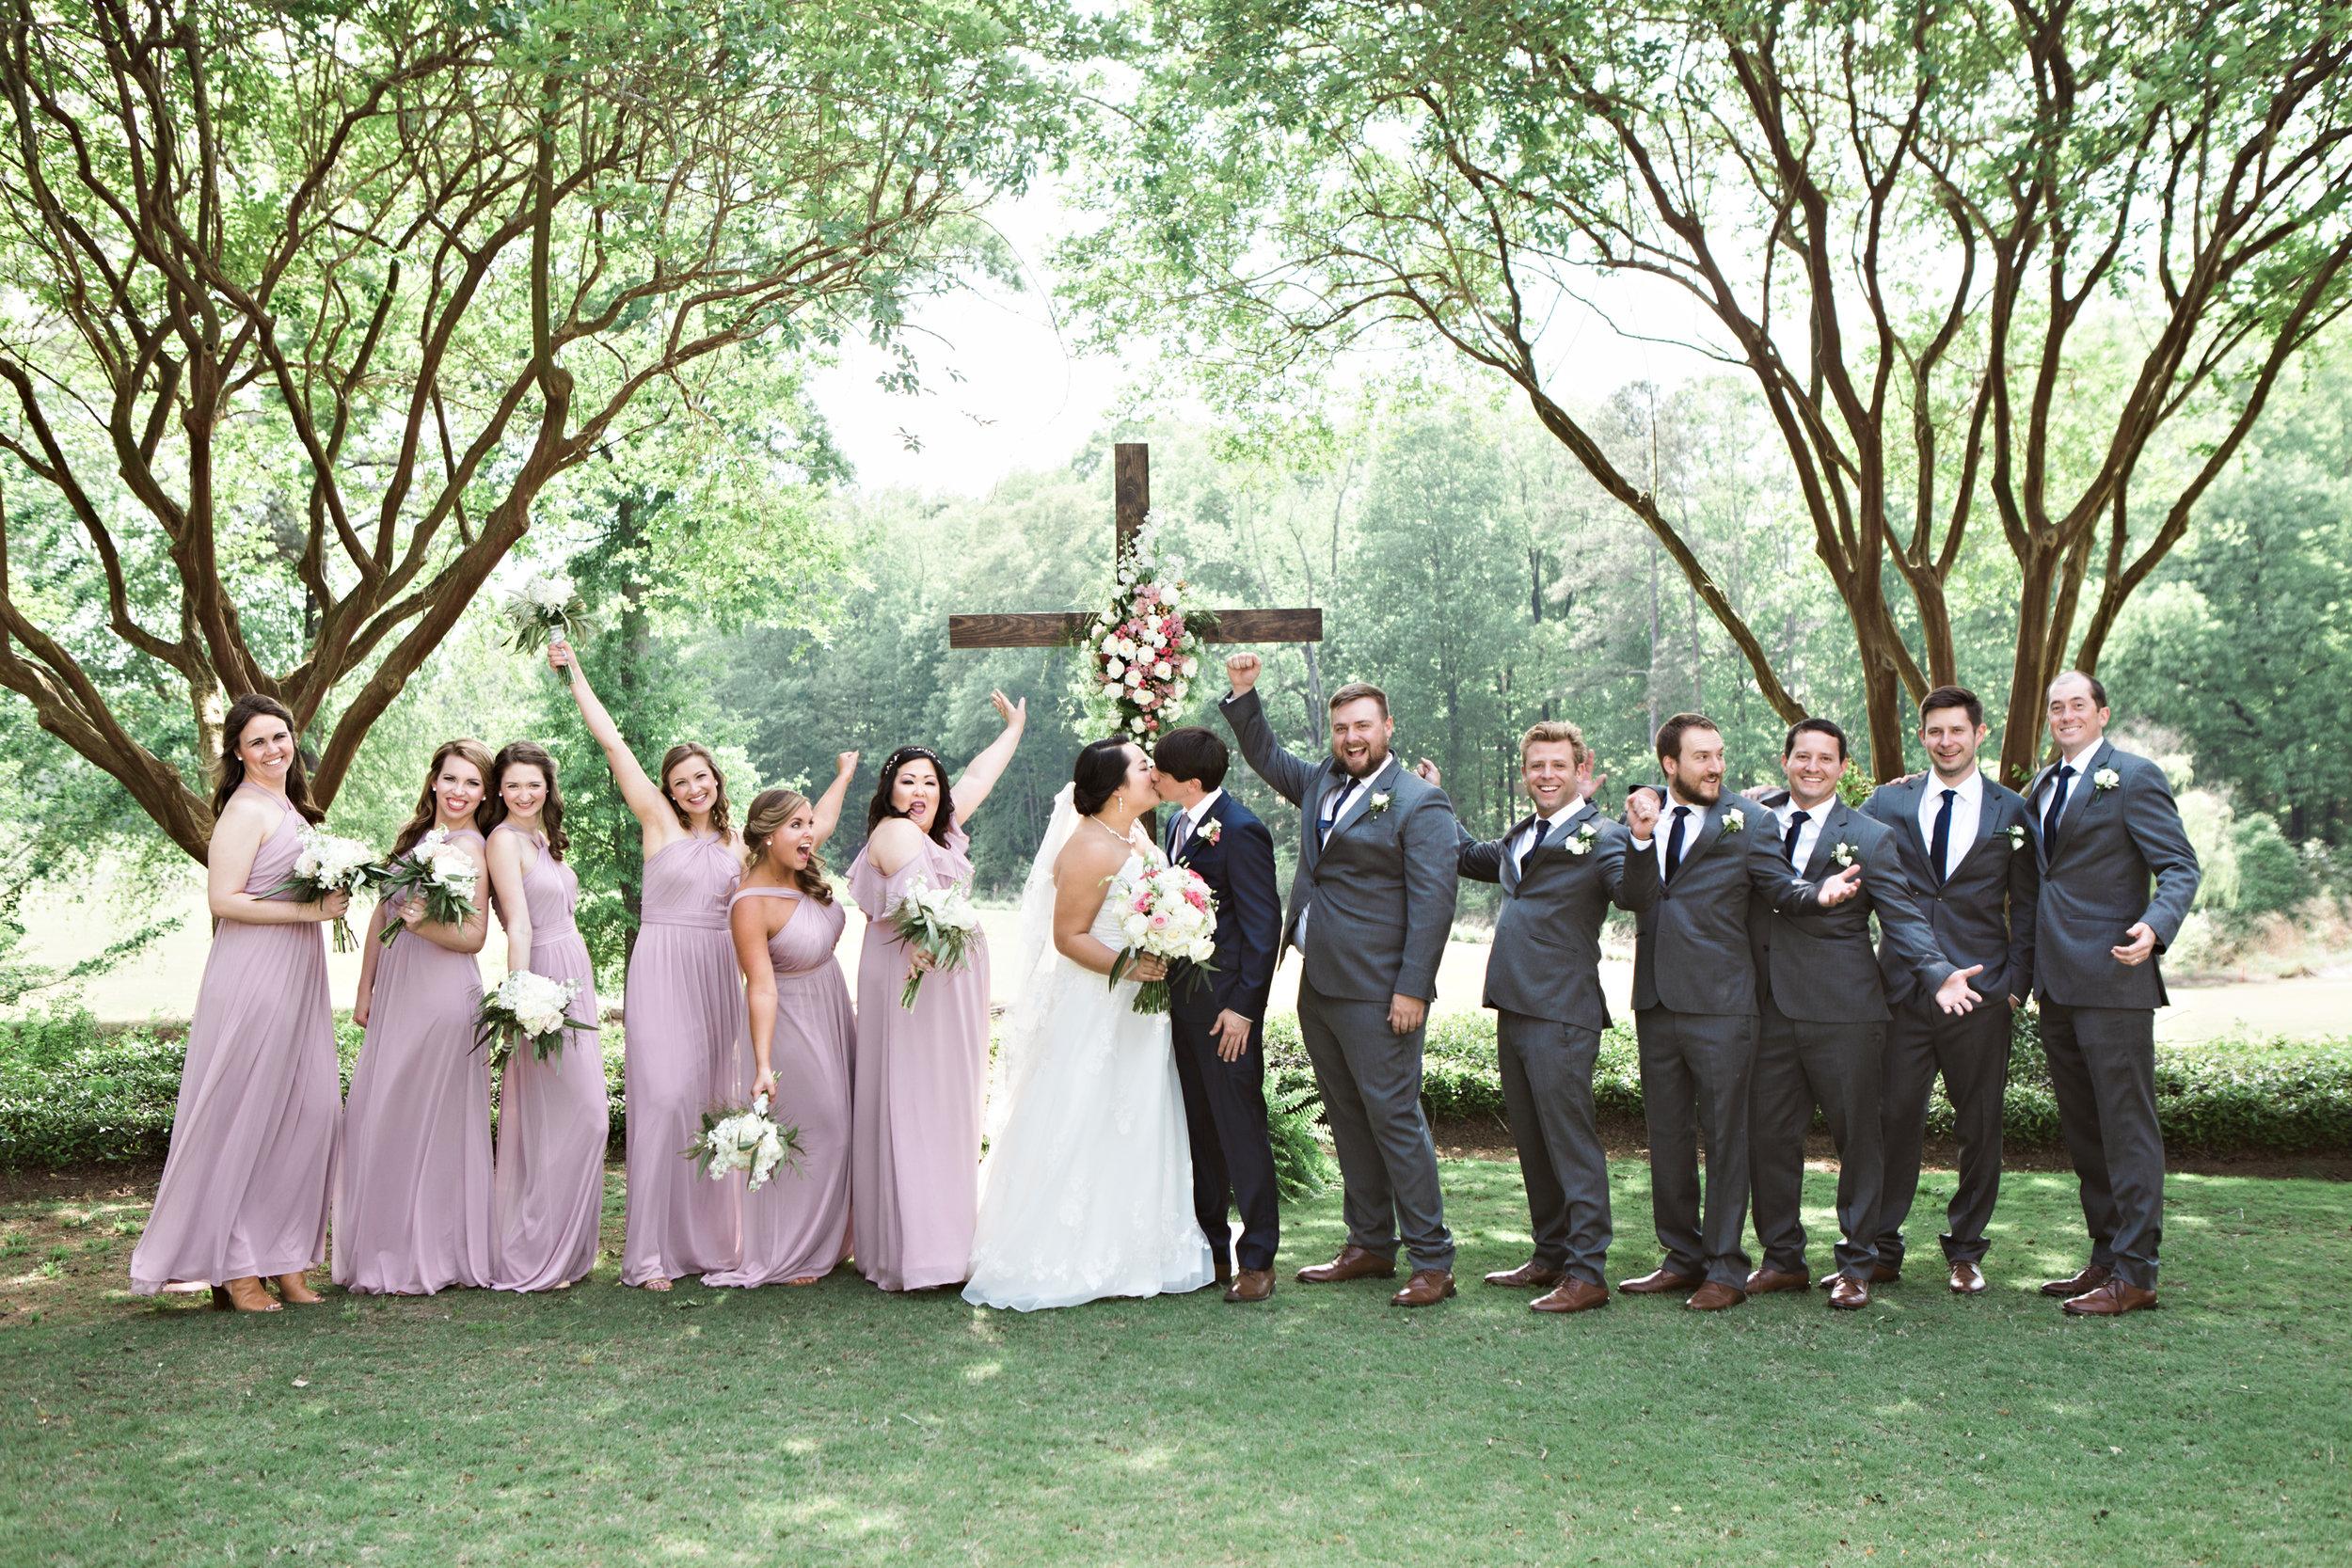 Ni ck-Drollette-Photography-Auburn-Alabama-Weddings-Sylvia-Kevin-122.jpg